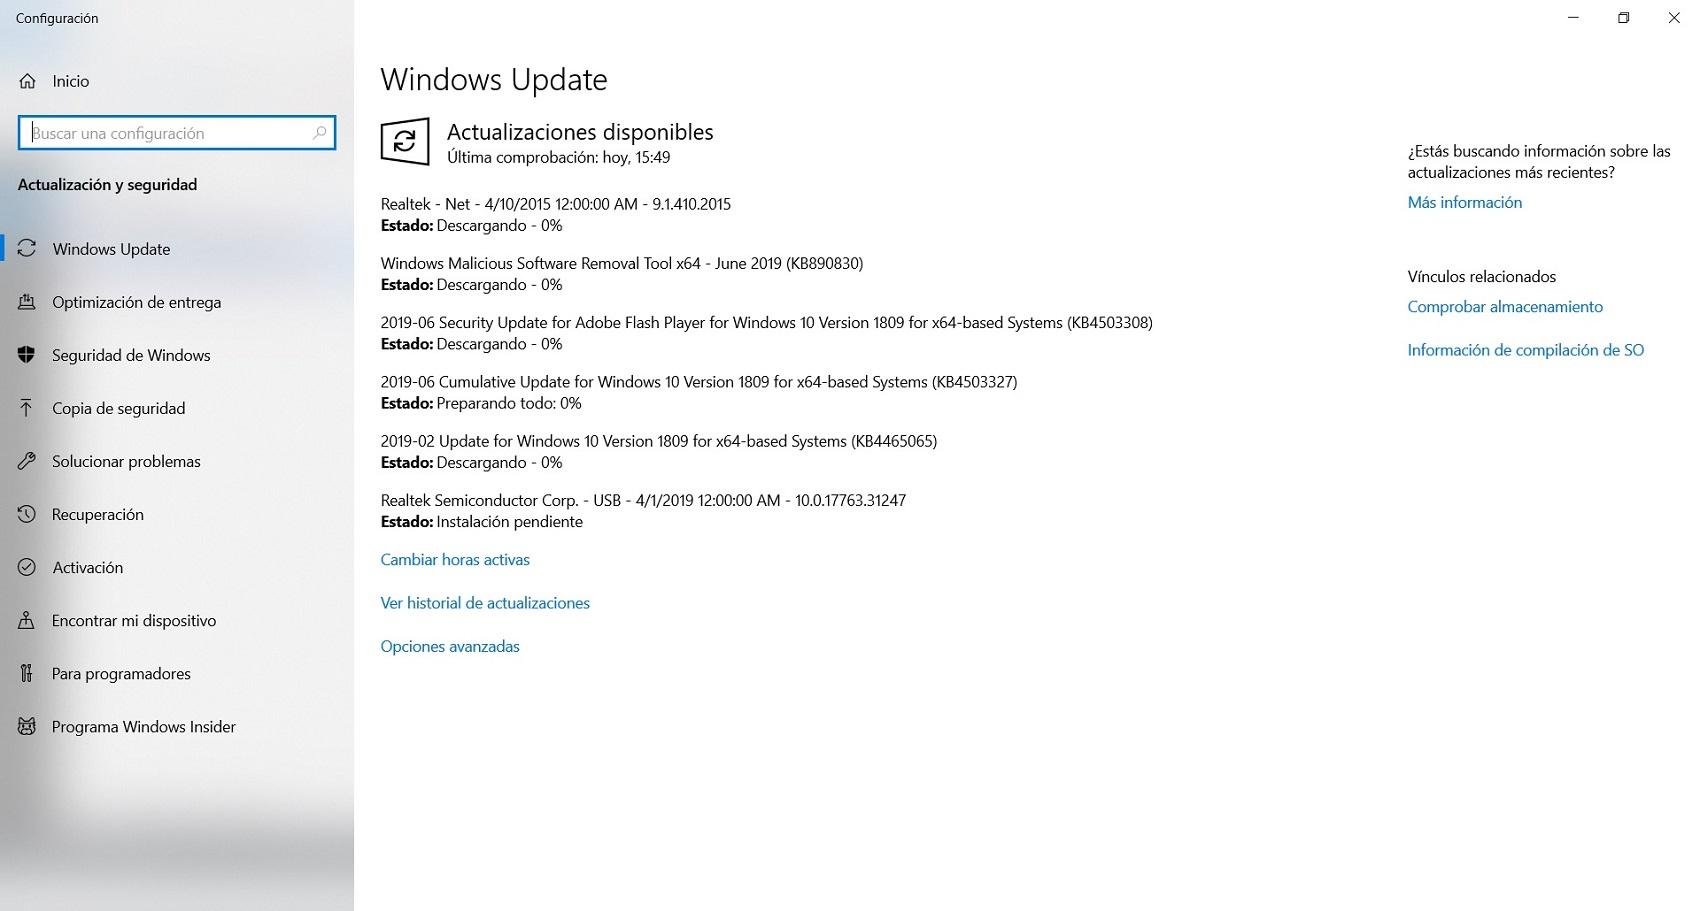 Actualizar drivers de la placa base con Windows Update 2